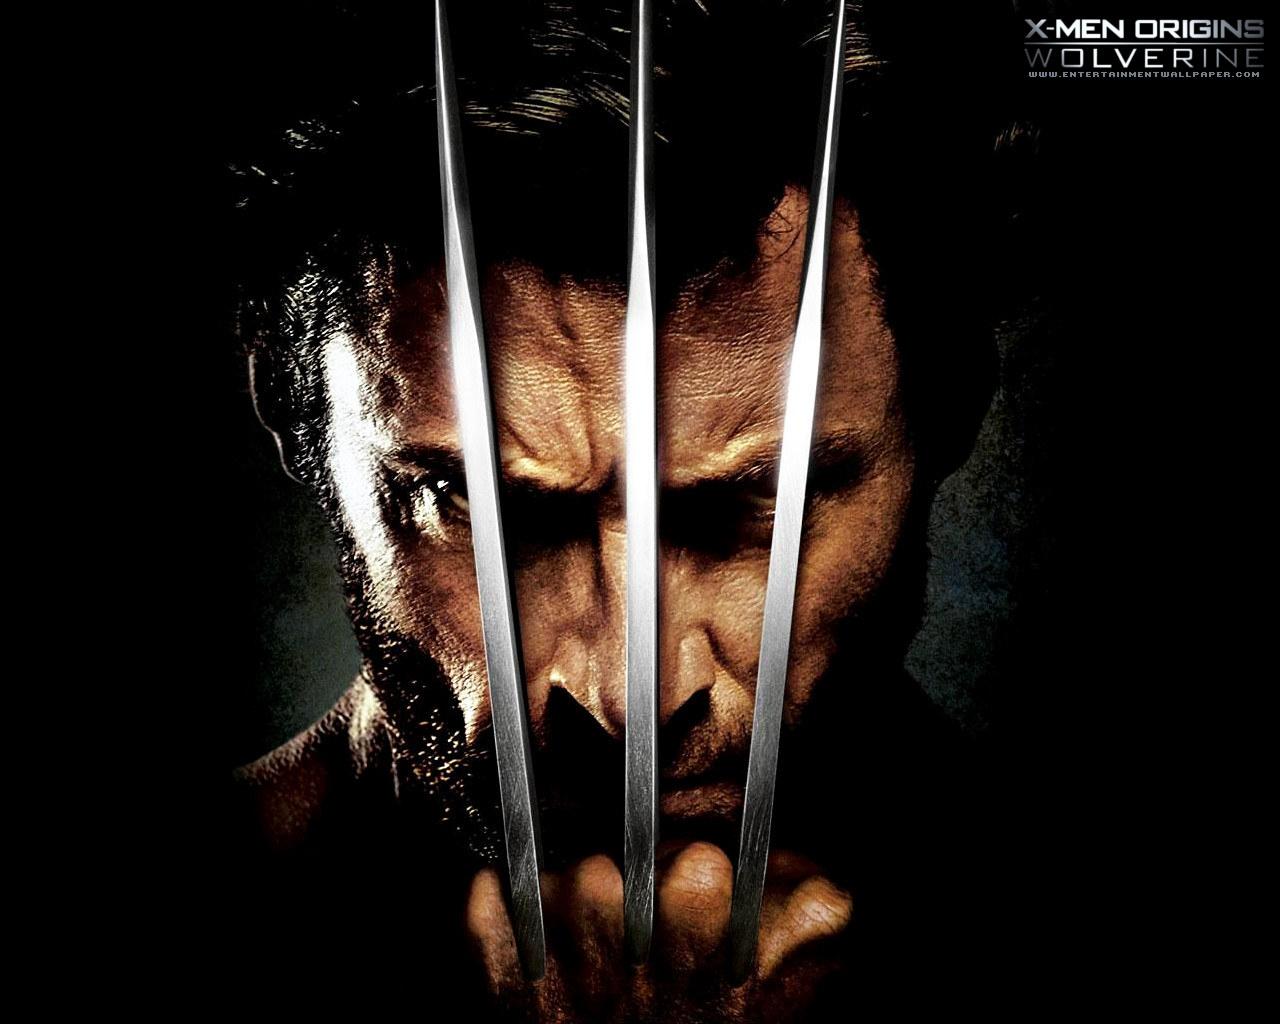 http://4.bp.blogspot.com/-DKz8-tef348/TiUiwYAjTcI/AAAAAAAACYc/6LloinDQDjY/s1600/%2528110909222706%2529X-Men_Wolverine_Wallpaper_2.jpg